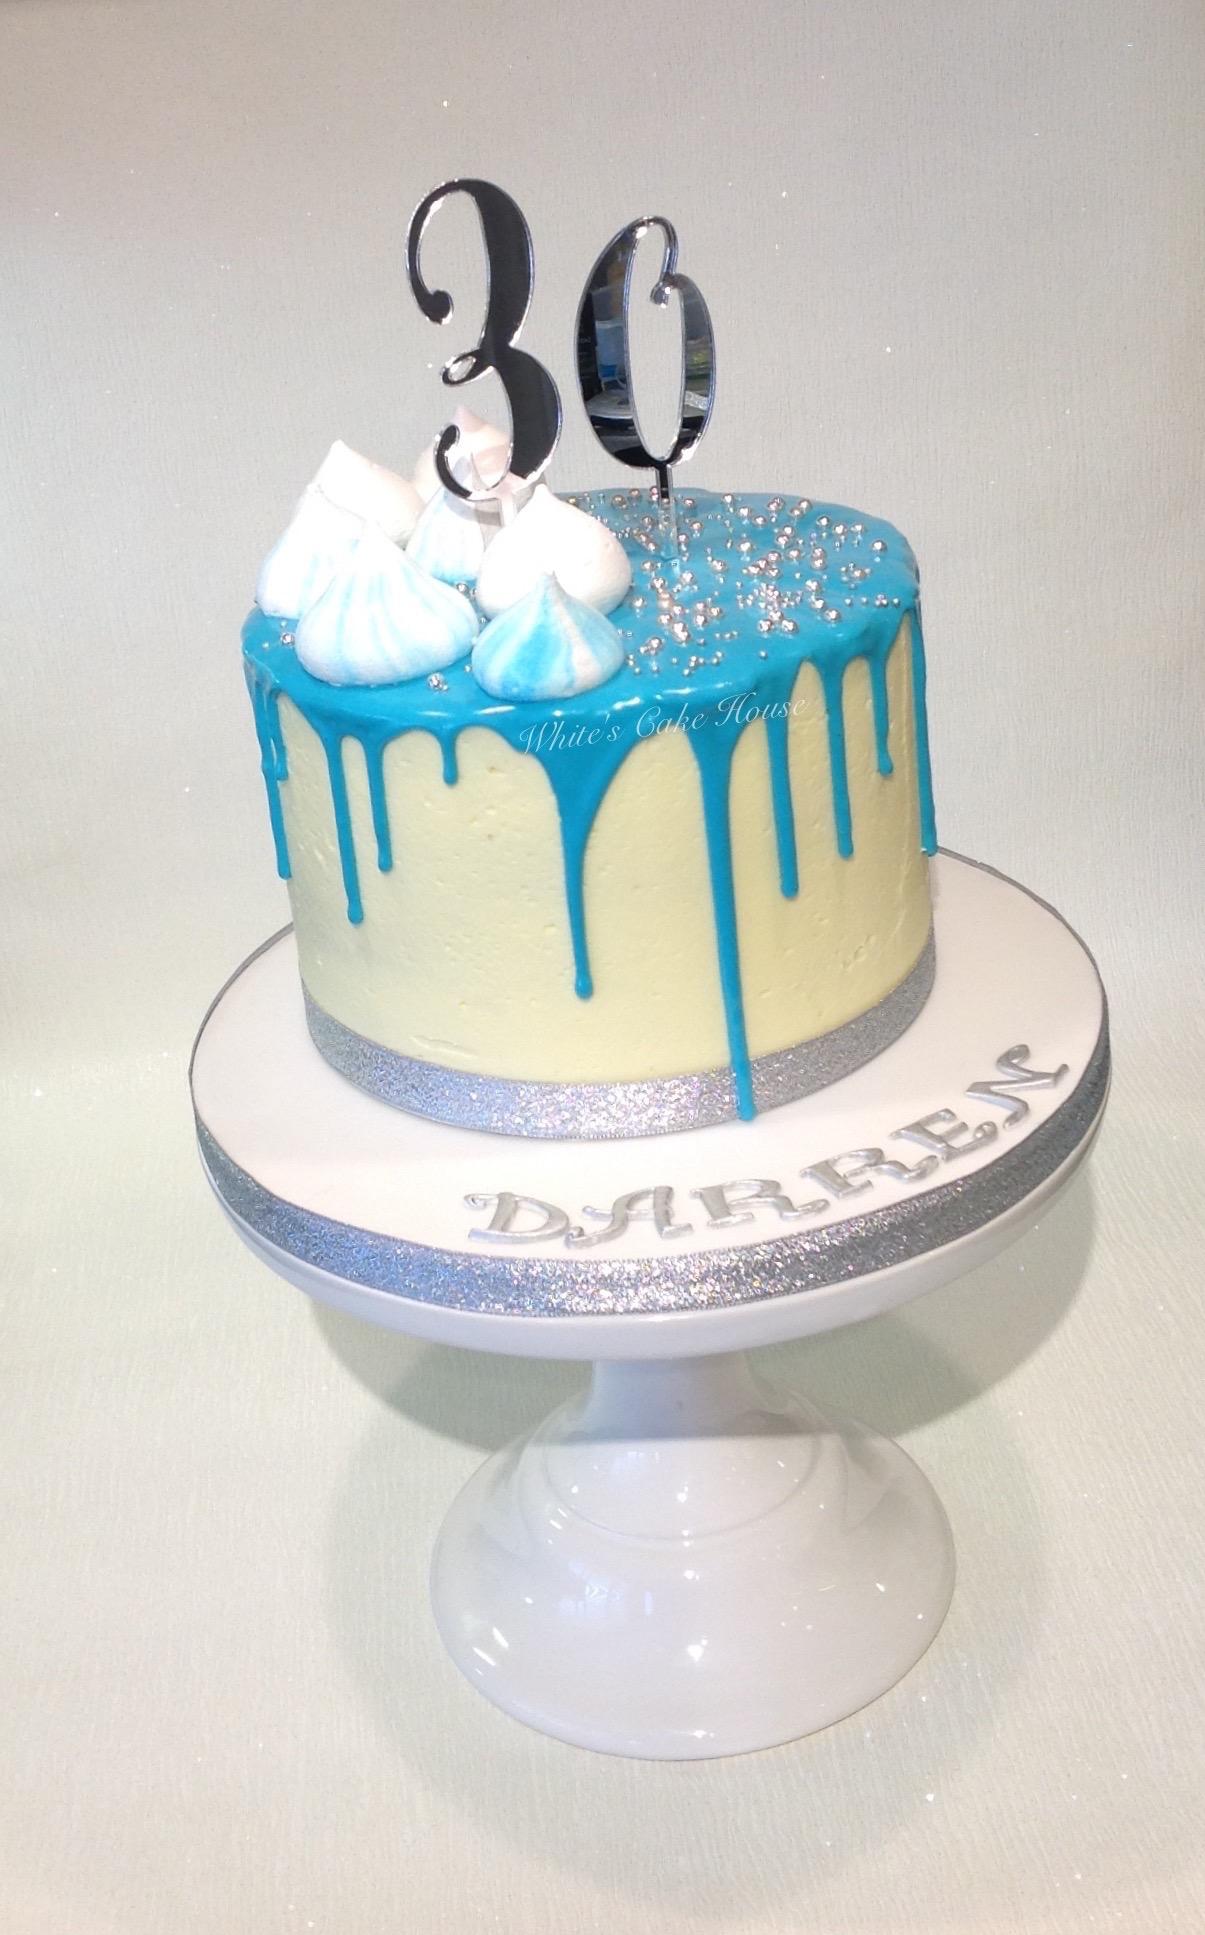 Birthdays Boys   White's Cake House